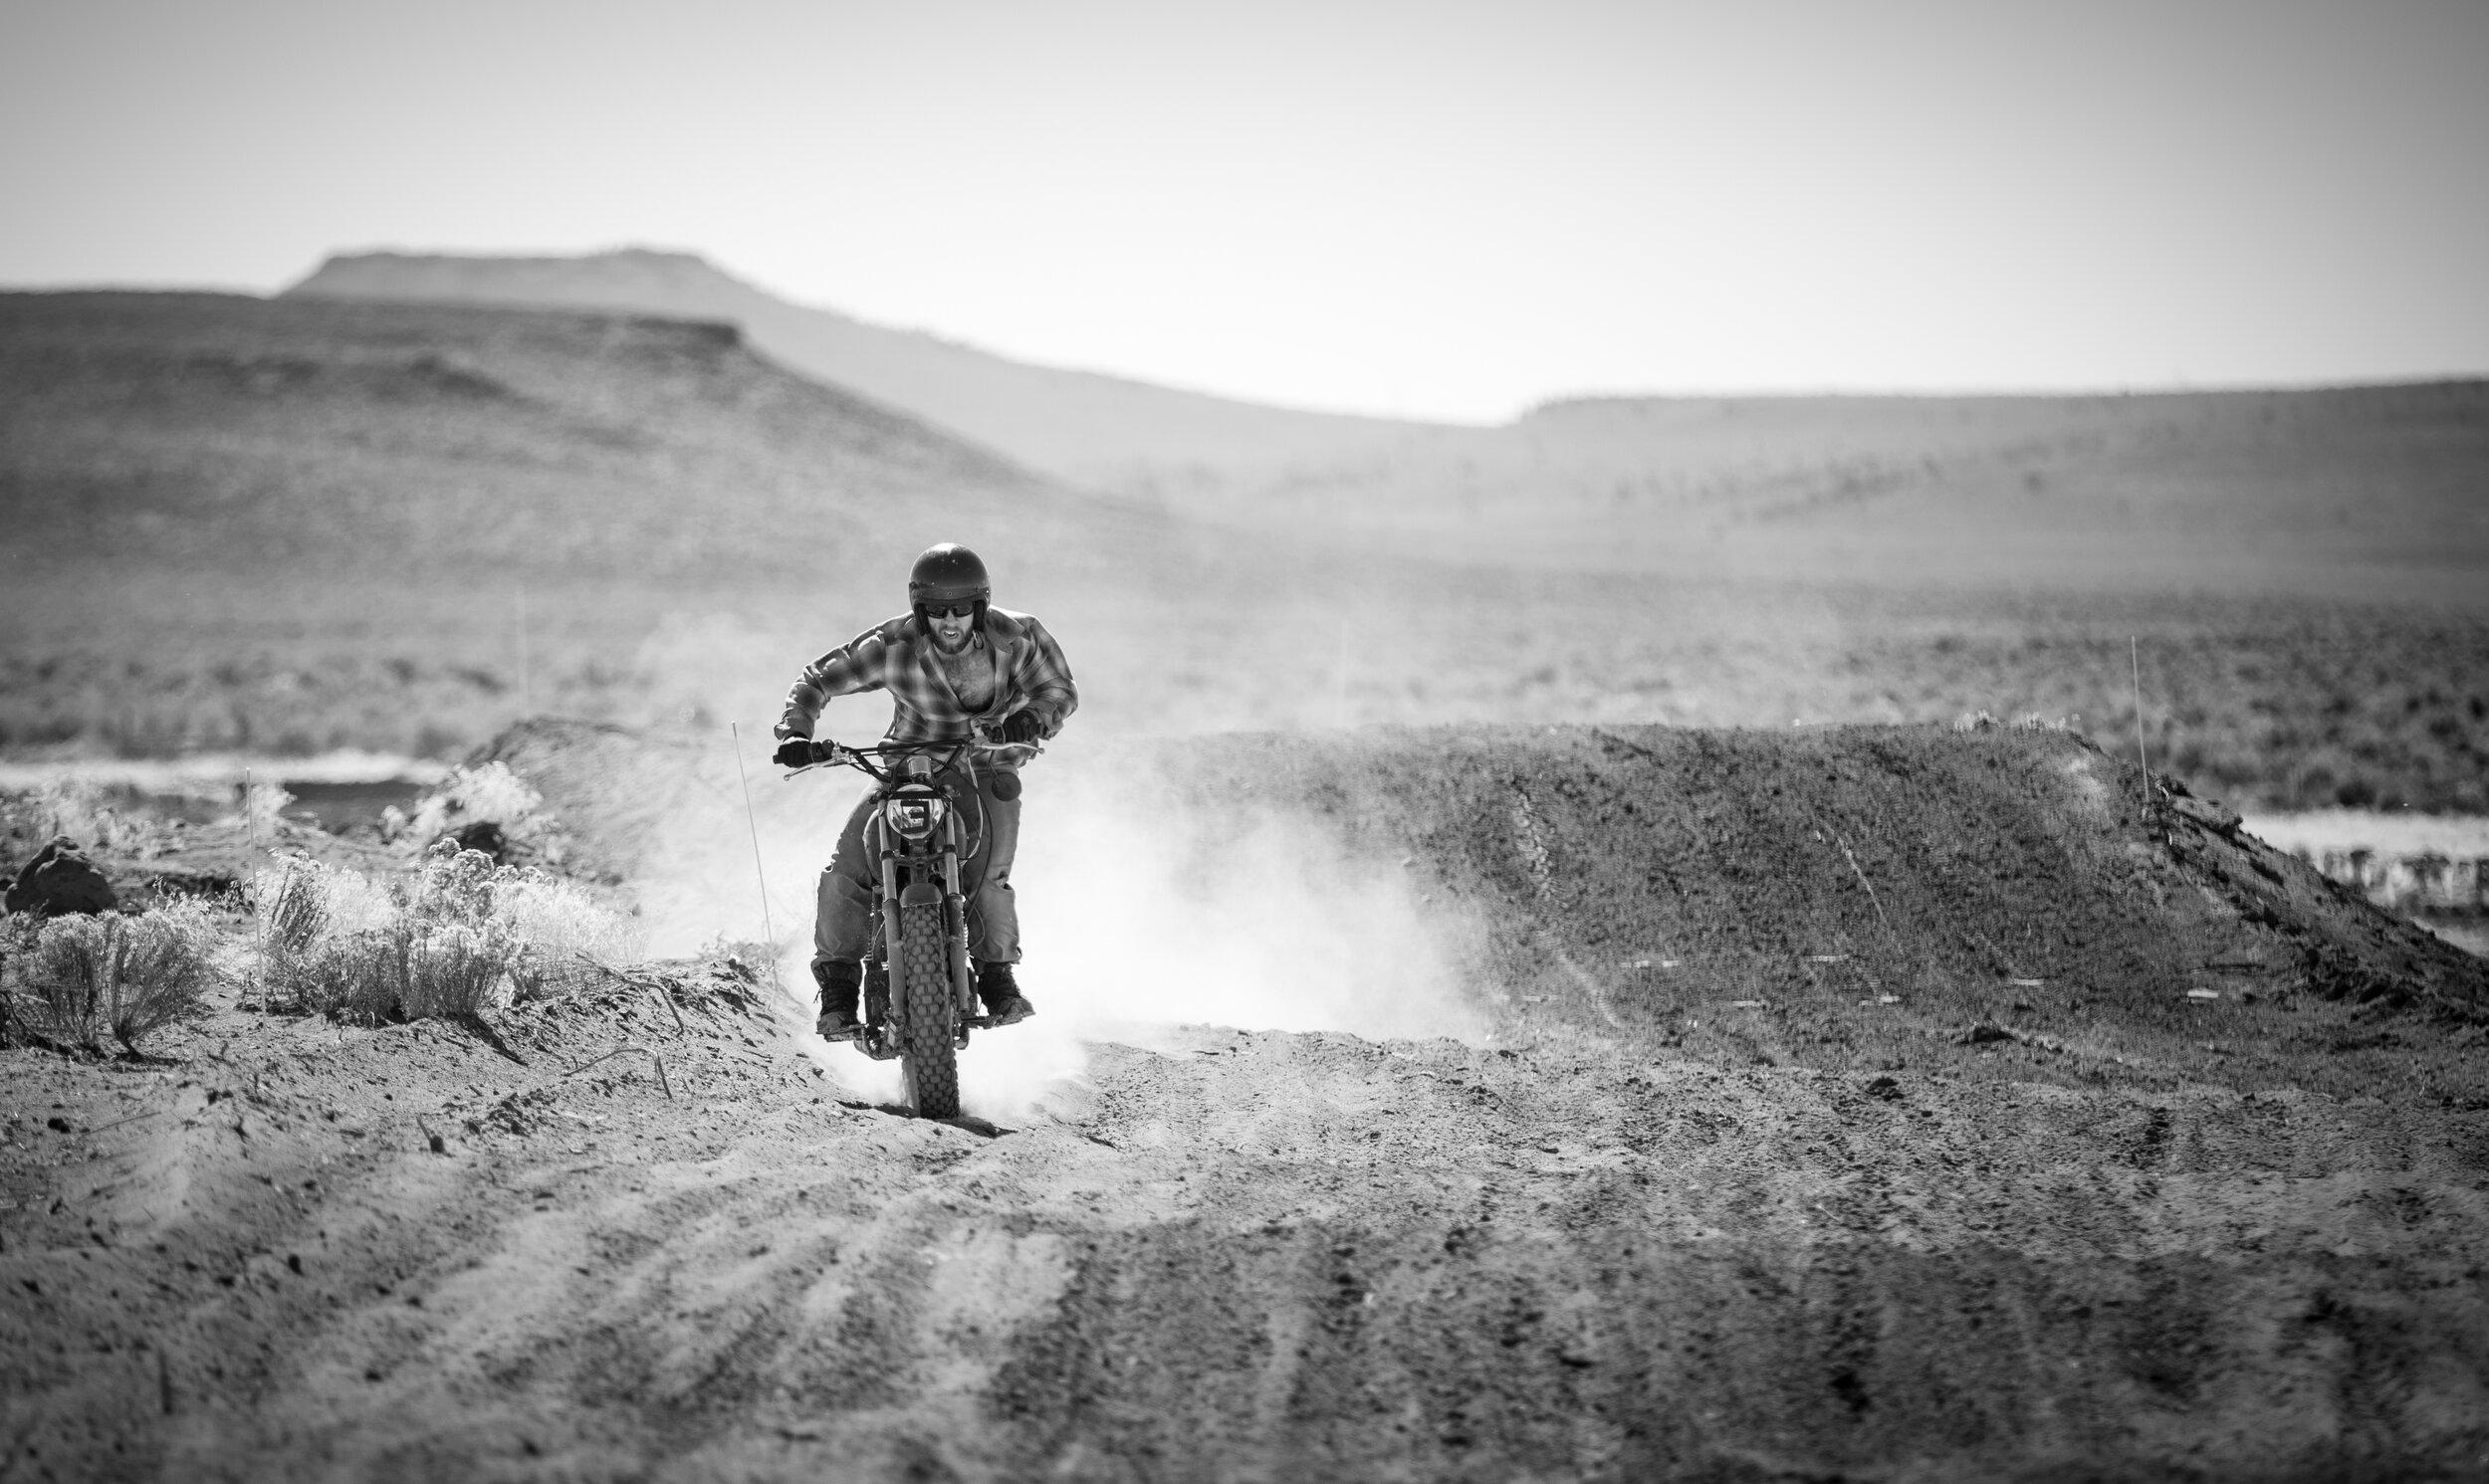 erikgraham_silodrome_the_desert_race_oregon 22.jpg